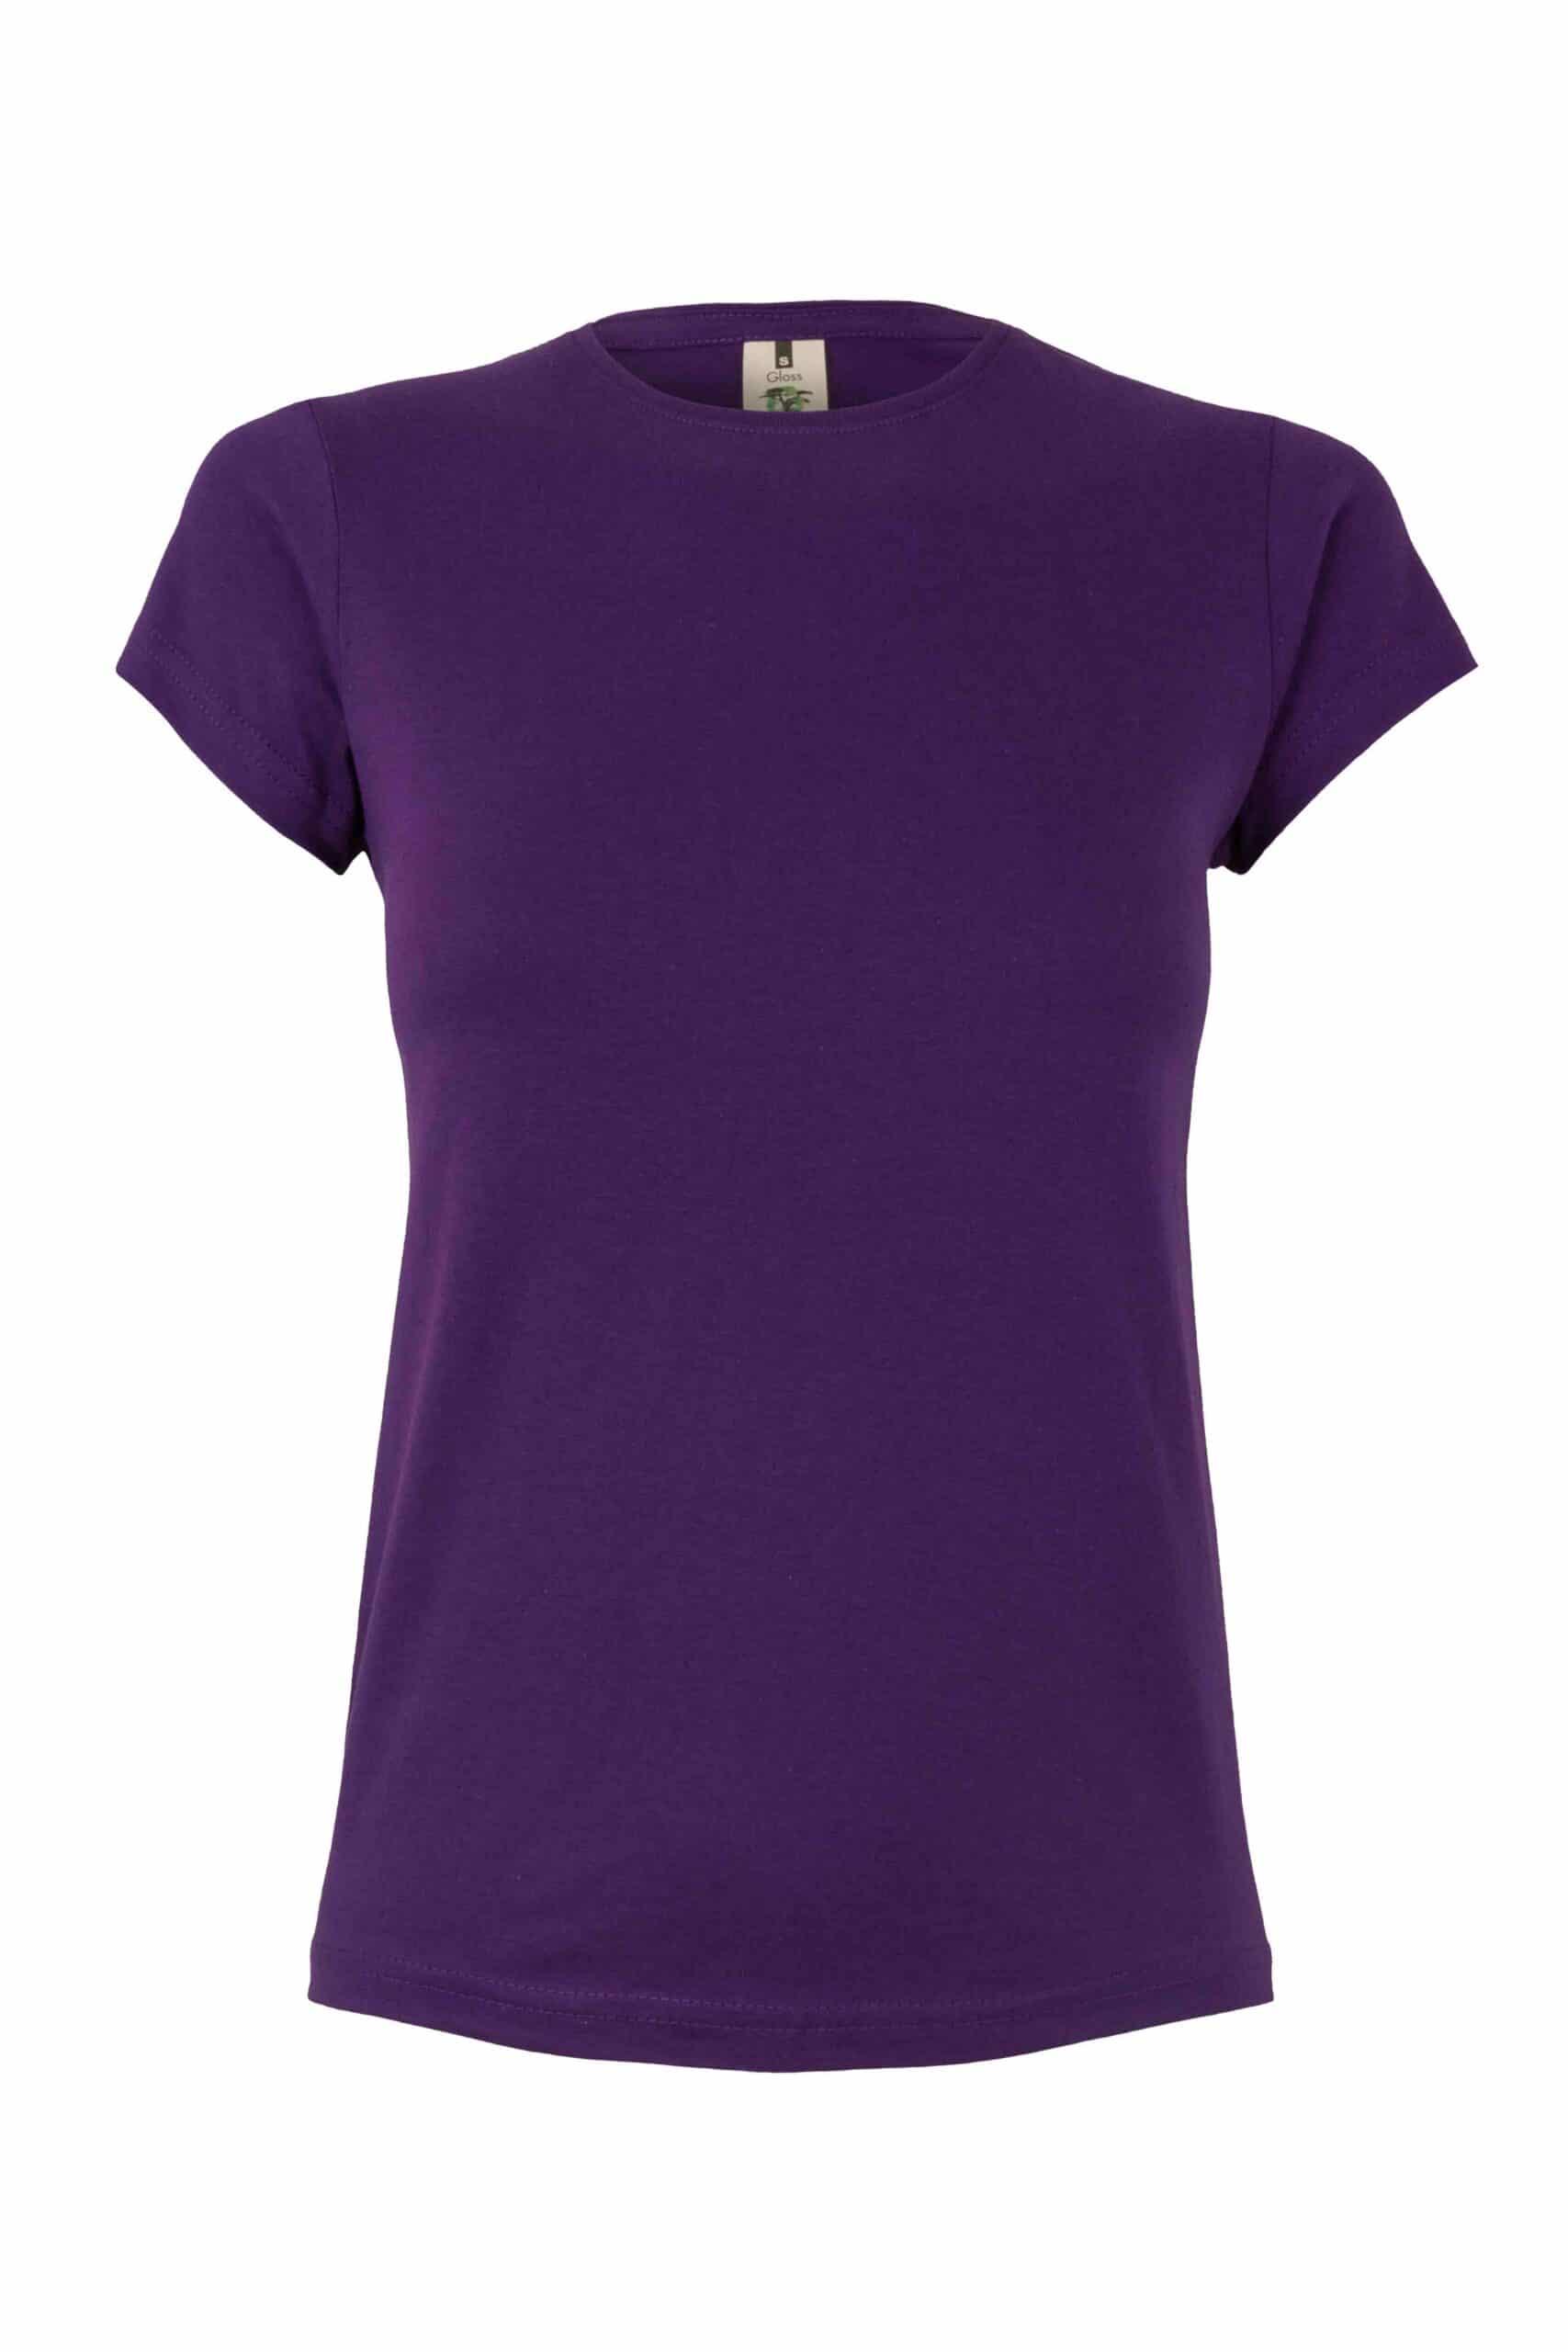 Mukua Mk170cv Camiseta Manga Corta 130gr Purple